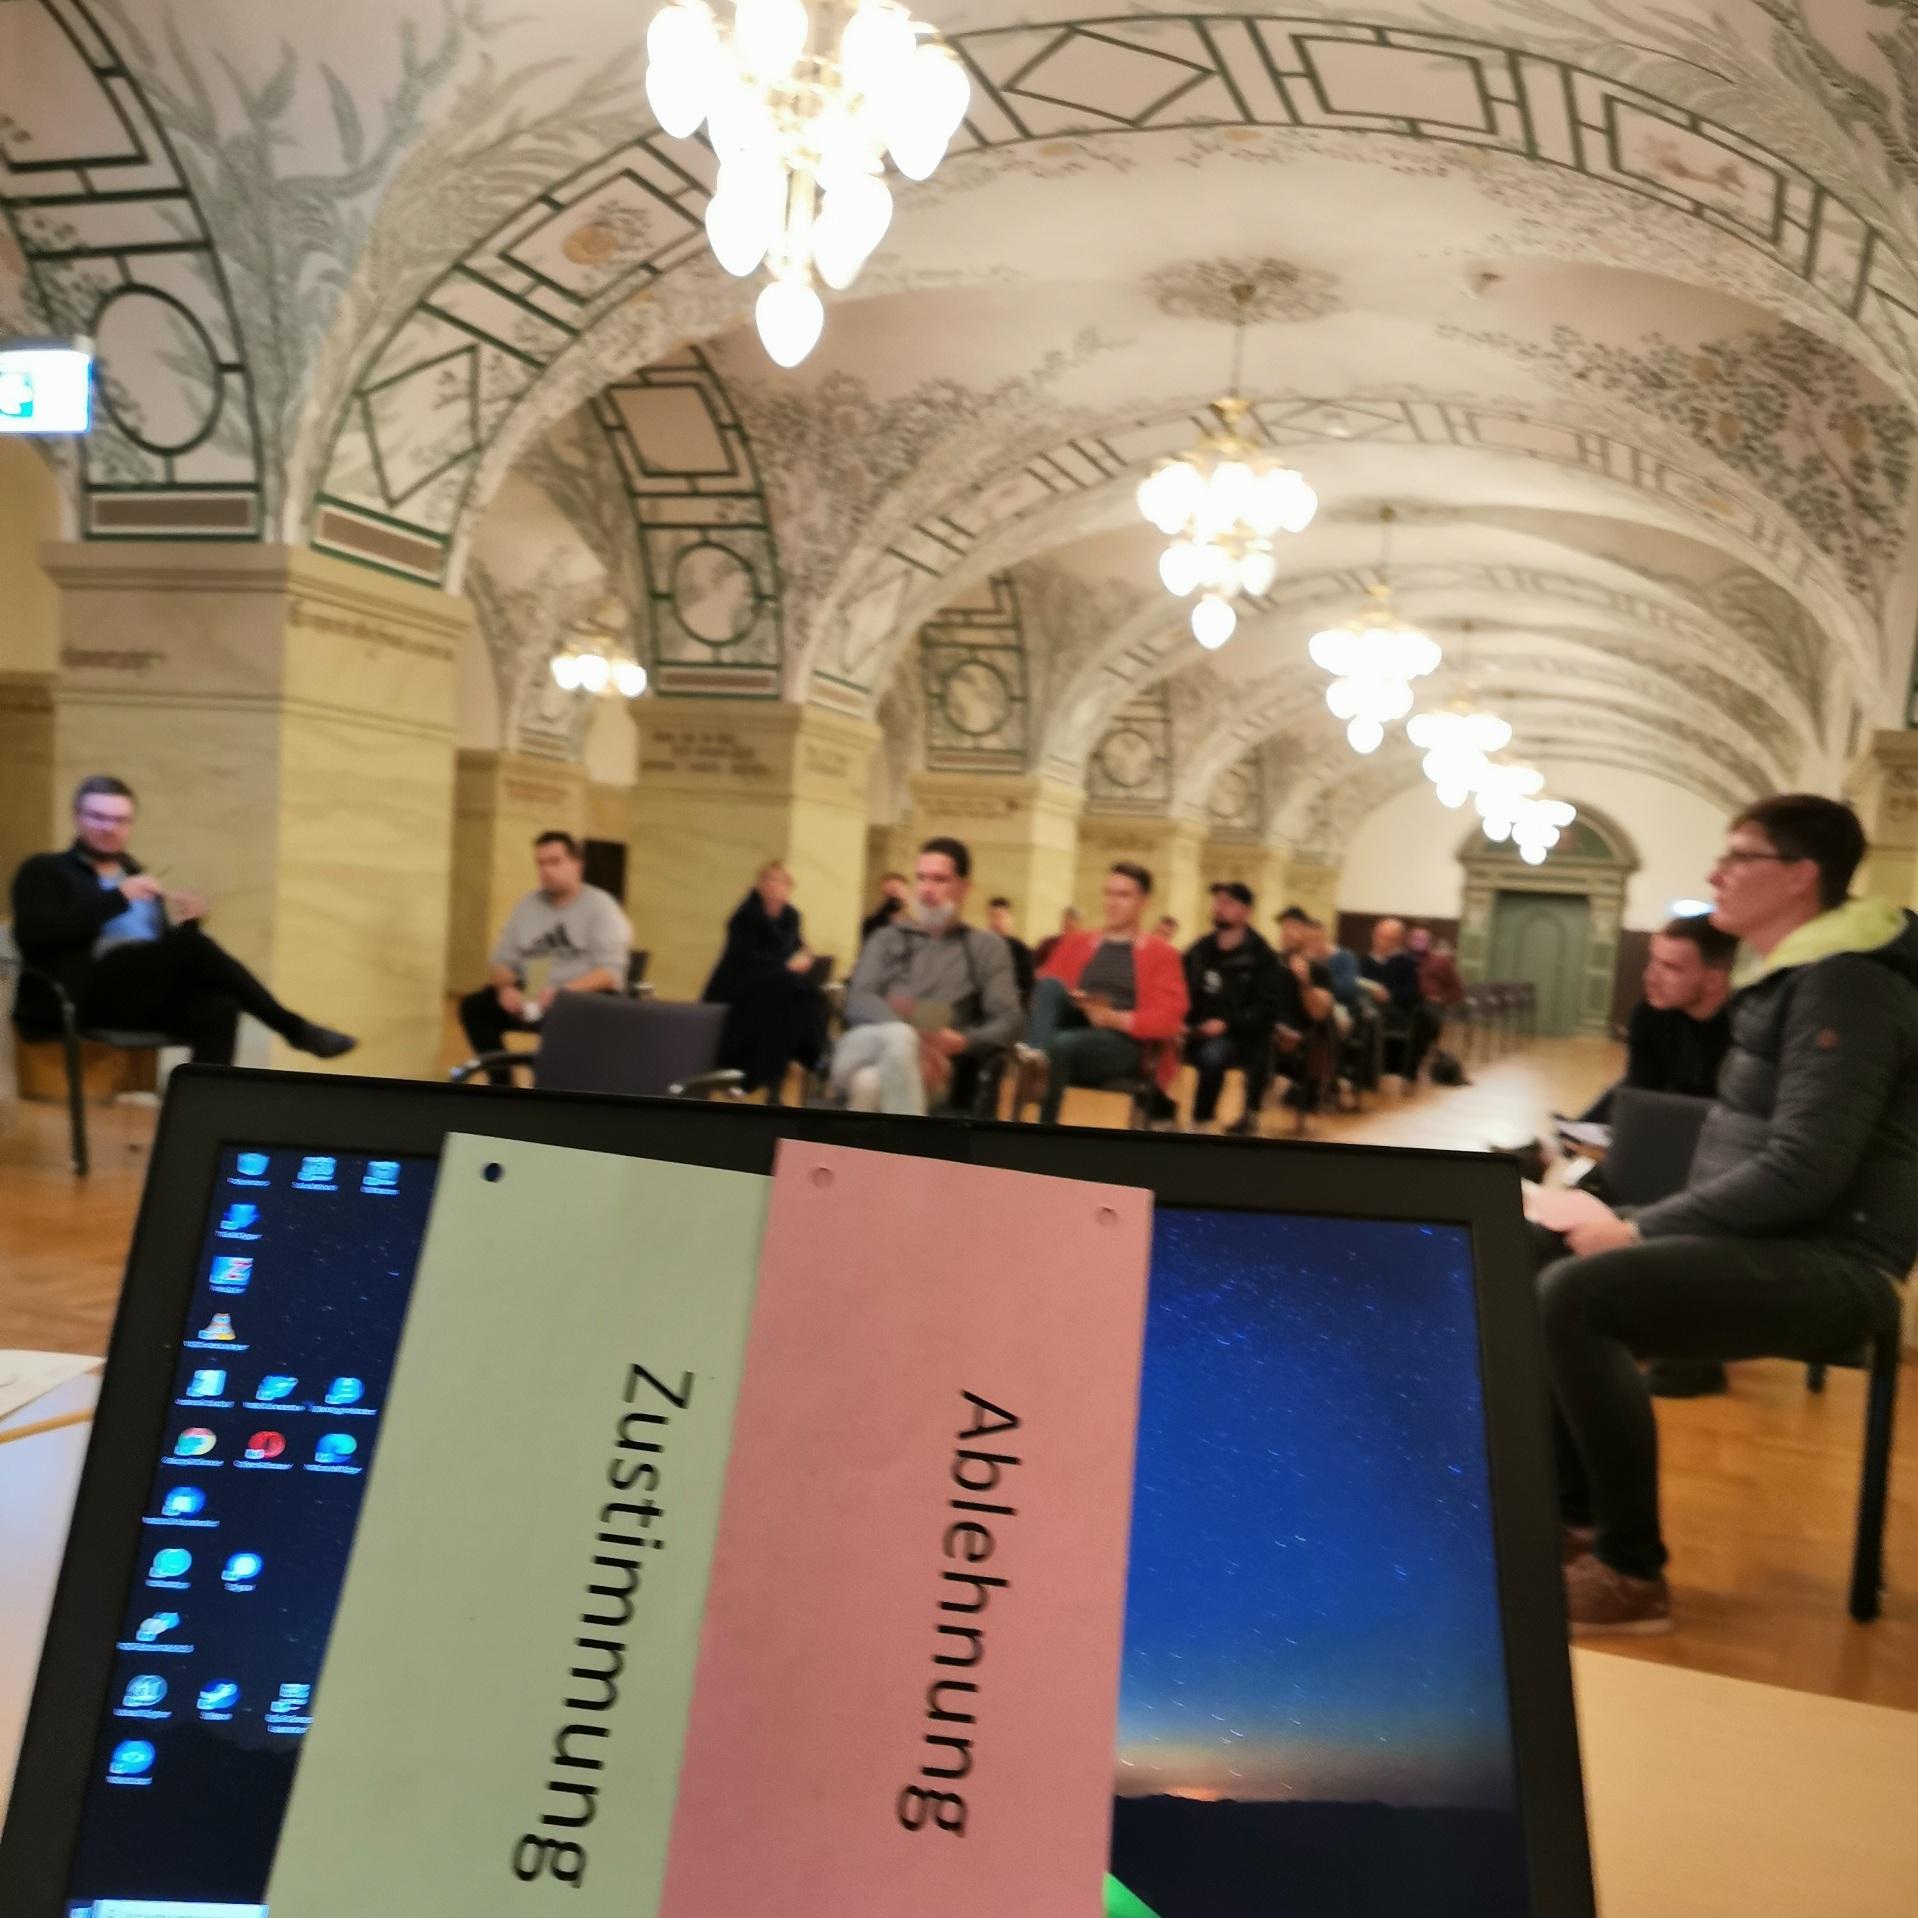 Mitgliederversammlung des CSD Dresden e.V. am 11.10.2020